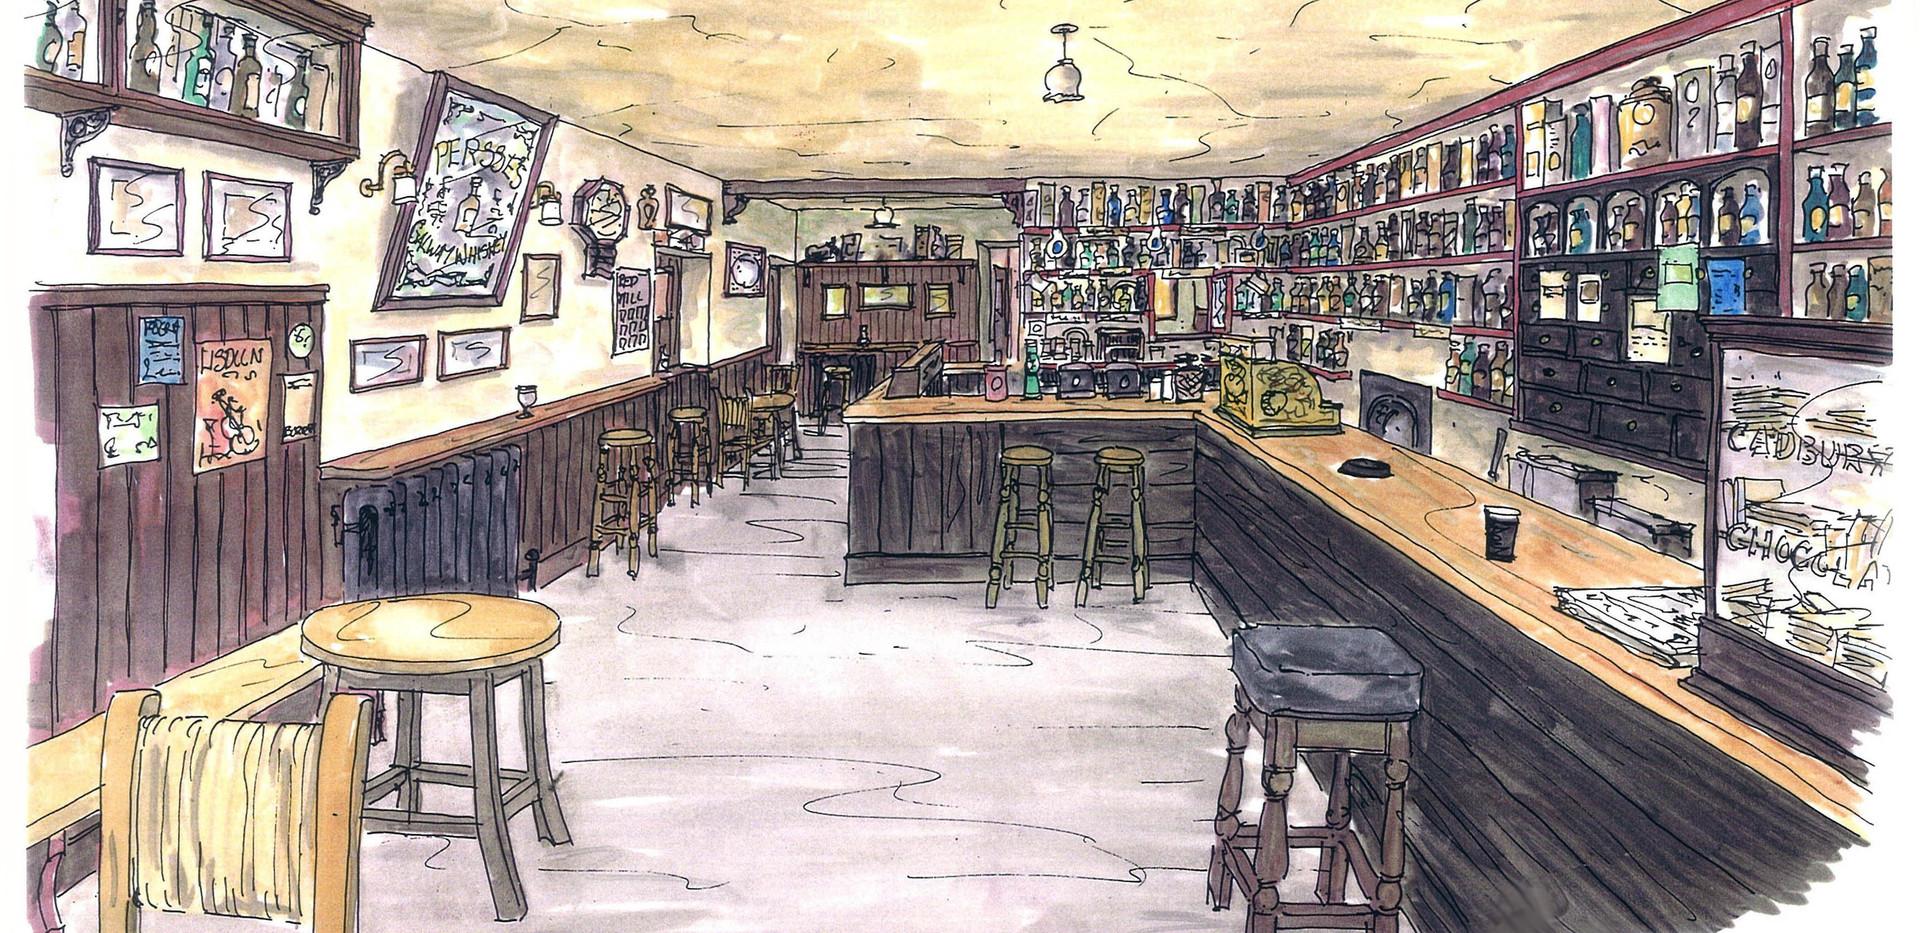 O'Loclainn's Whiskey Bar, Ballyvaughan, Co. Clare,   AMDesign, Traditional Irish Pub Design & Fitout, Renovations, Angela Murphy Design Associates Ltd. www.amdesign.ie @amdesignireland